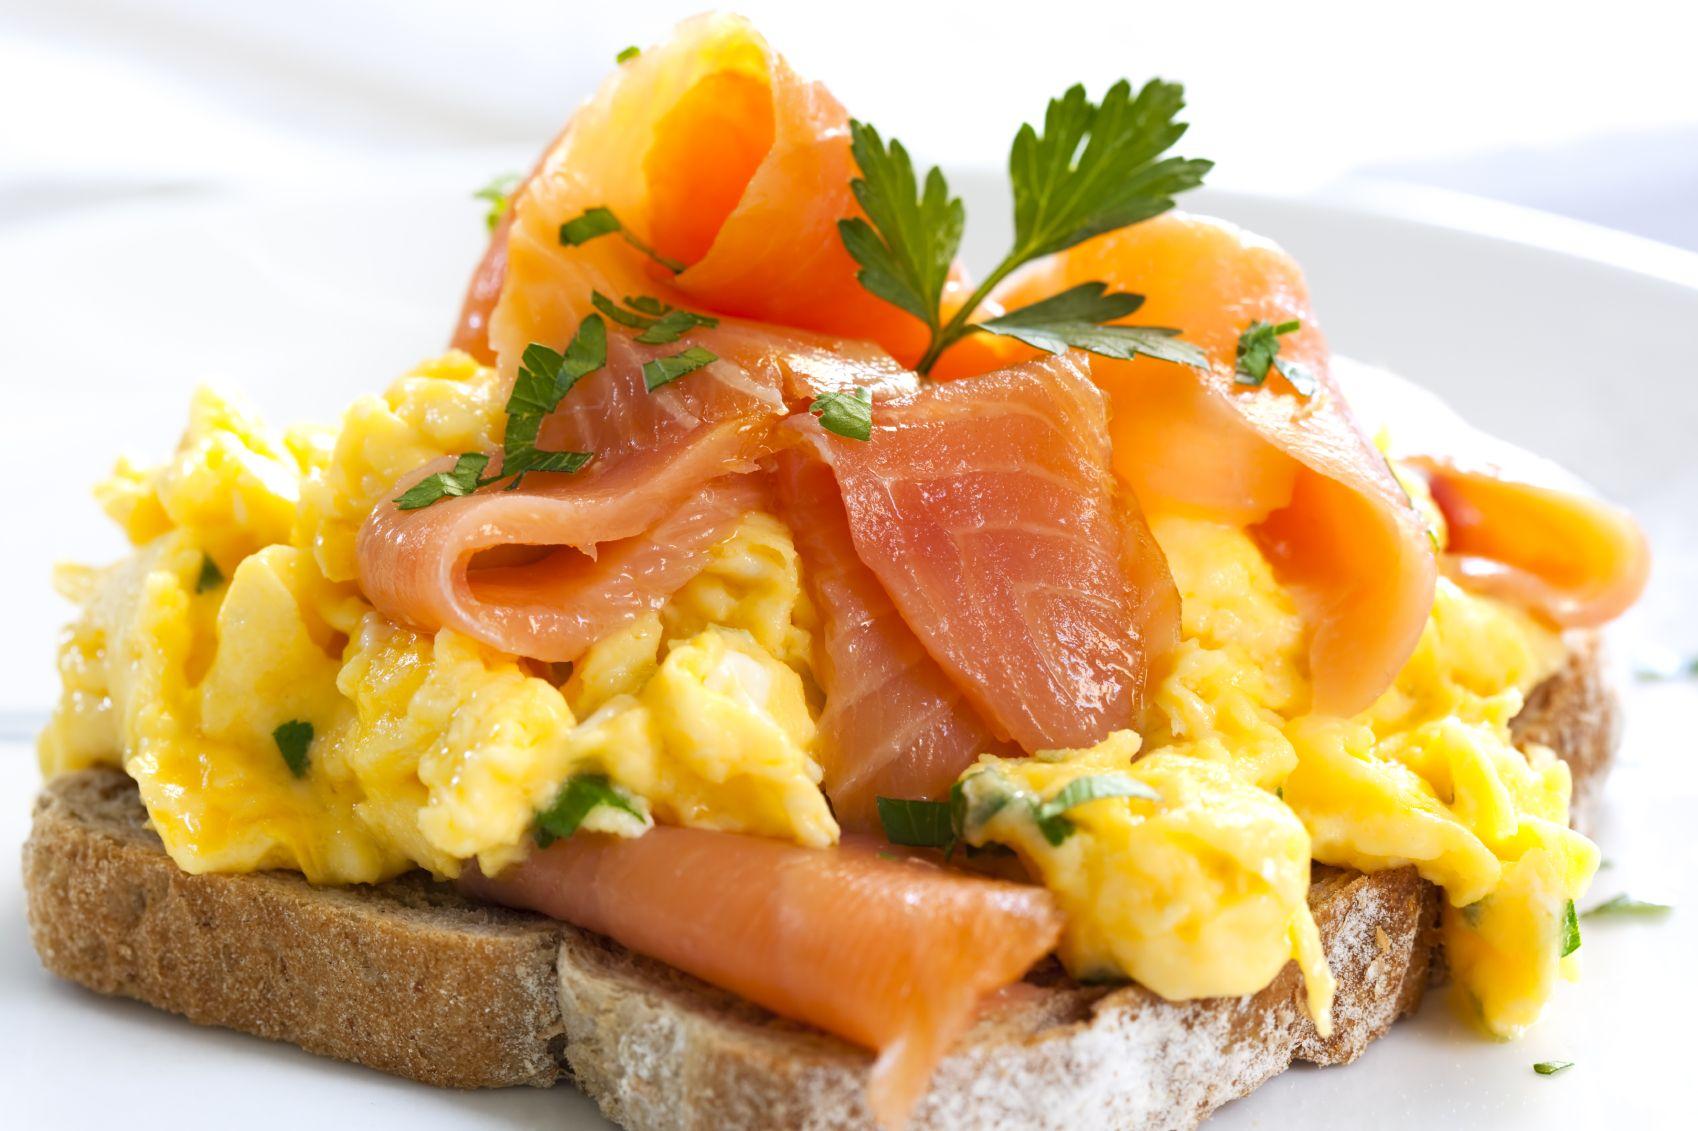 Luxury scrambled eggs with smoked salmon recipe